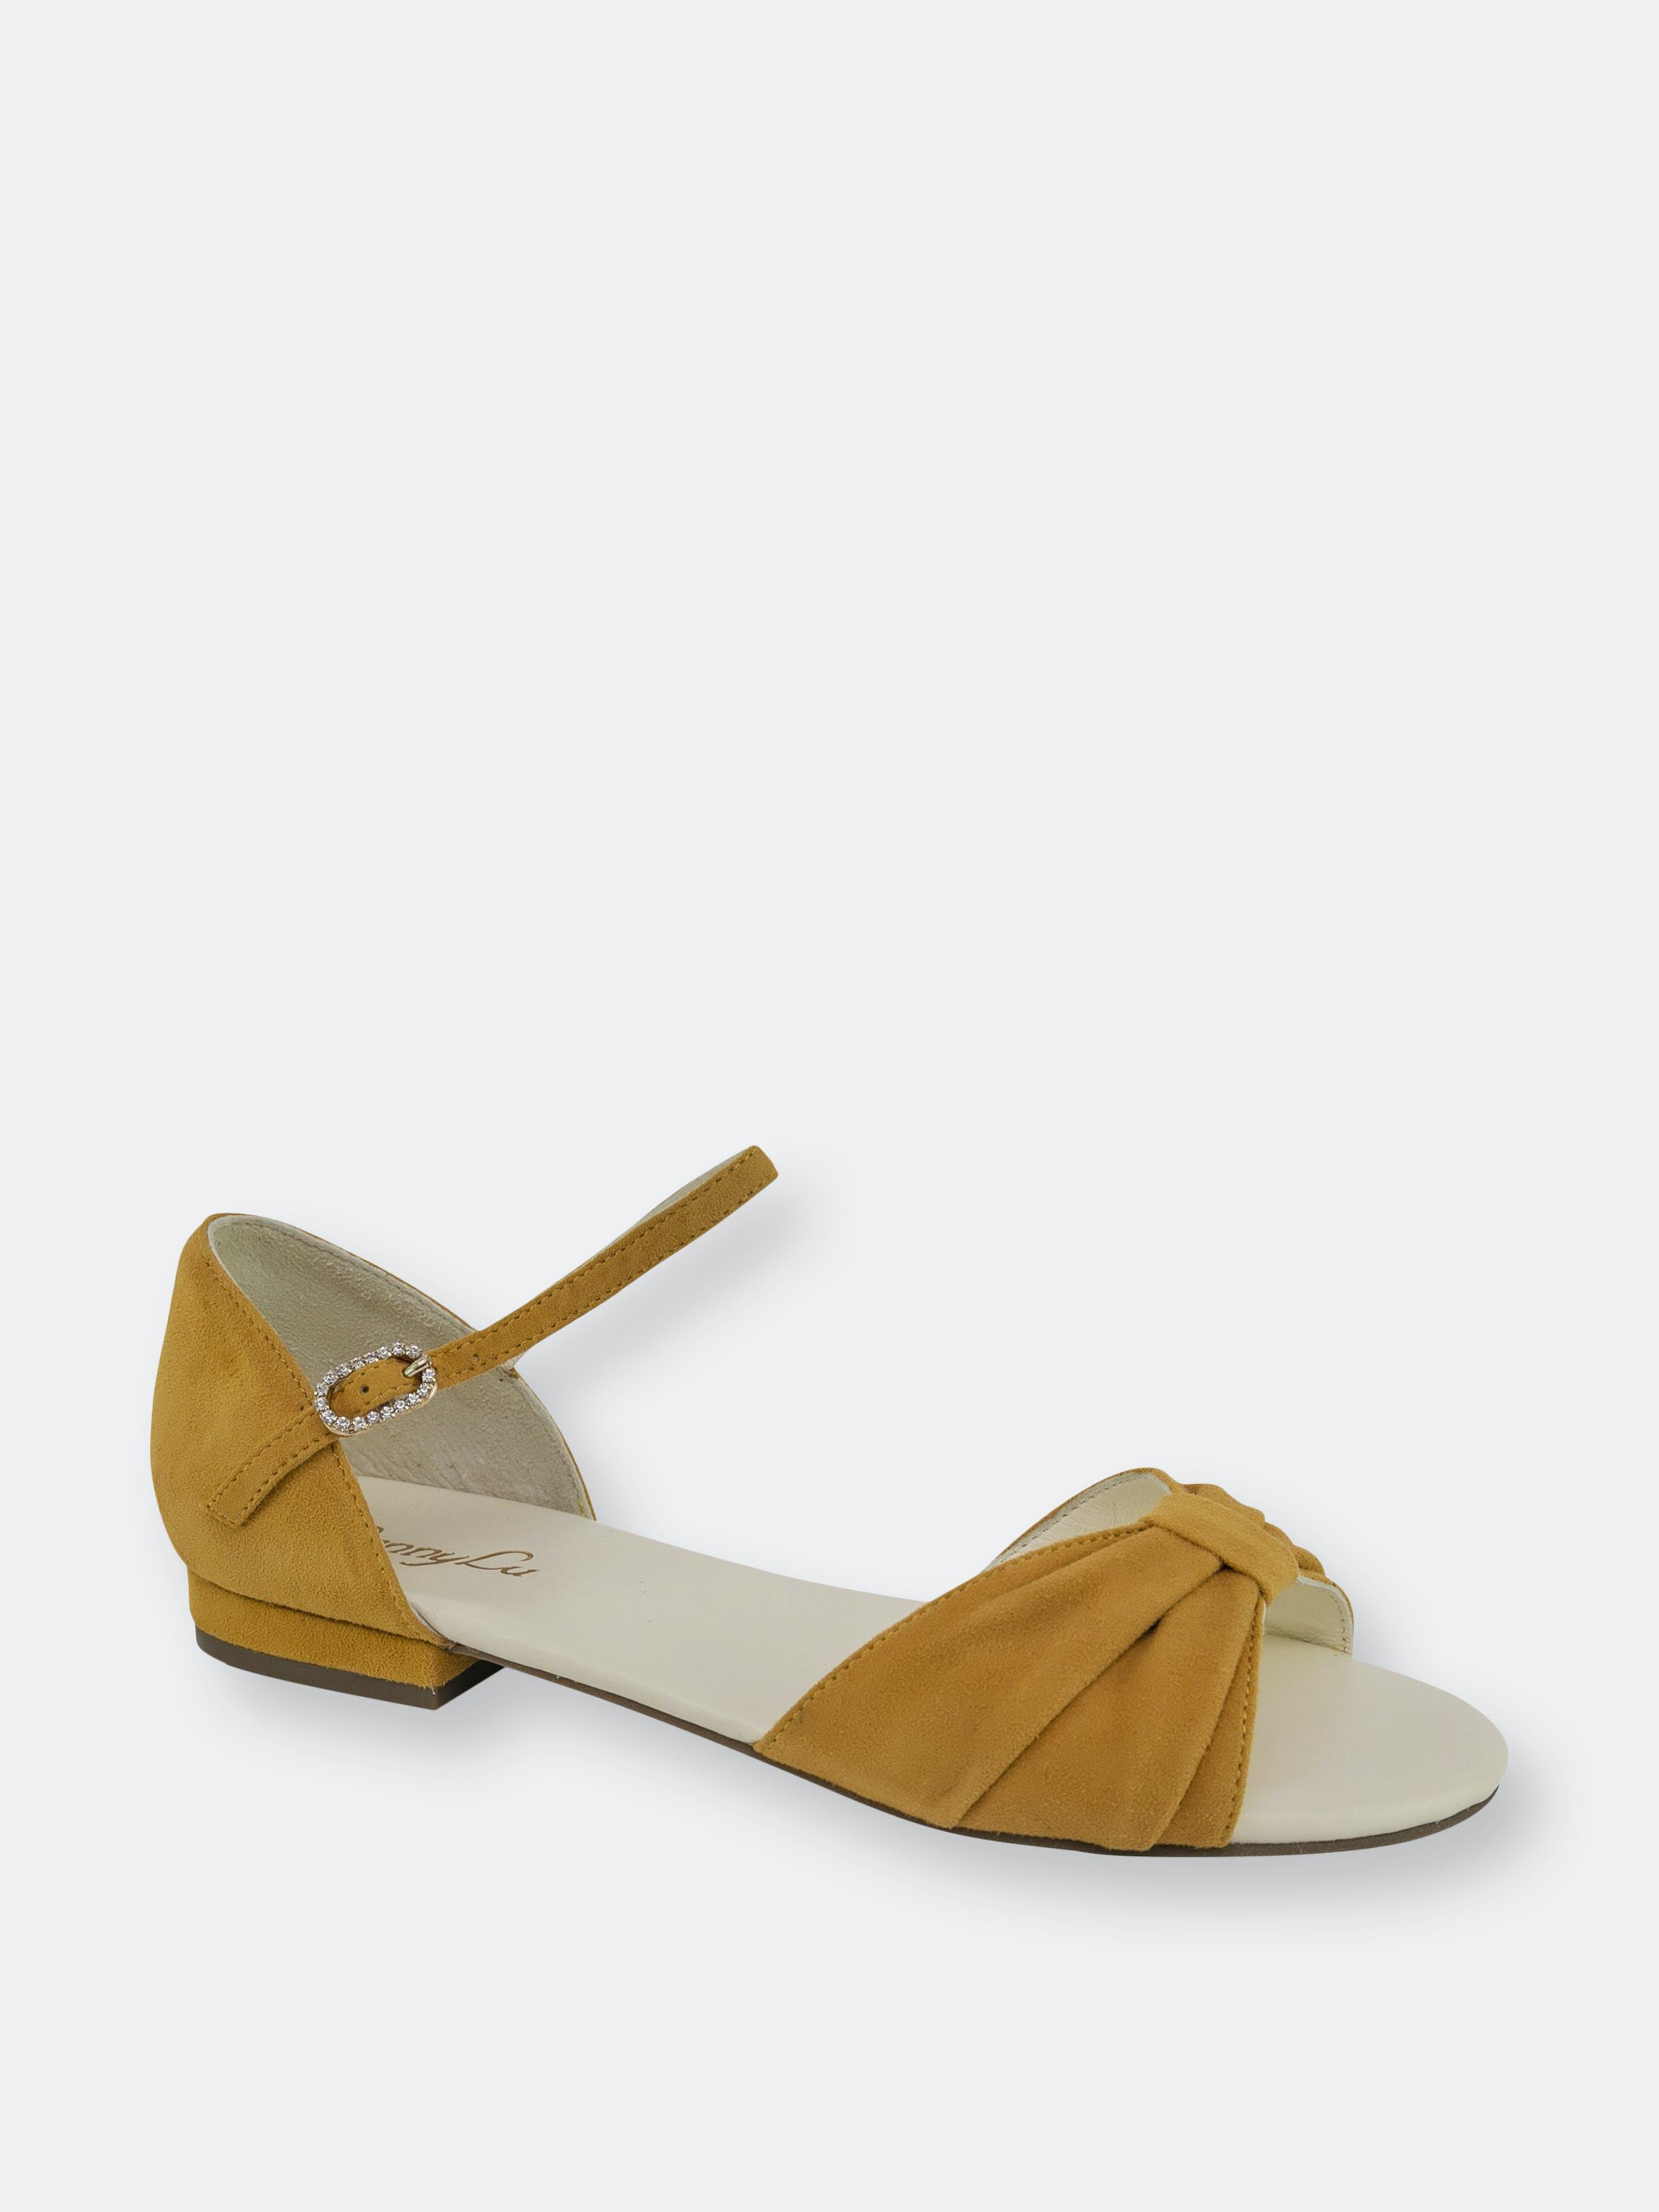 Lennylu Athena Bow Sandal In Brown